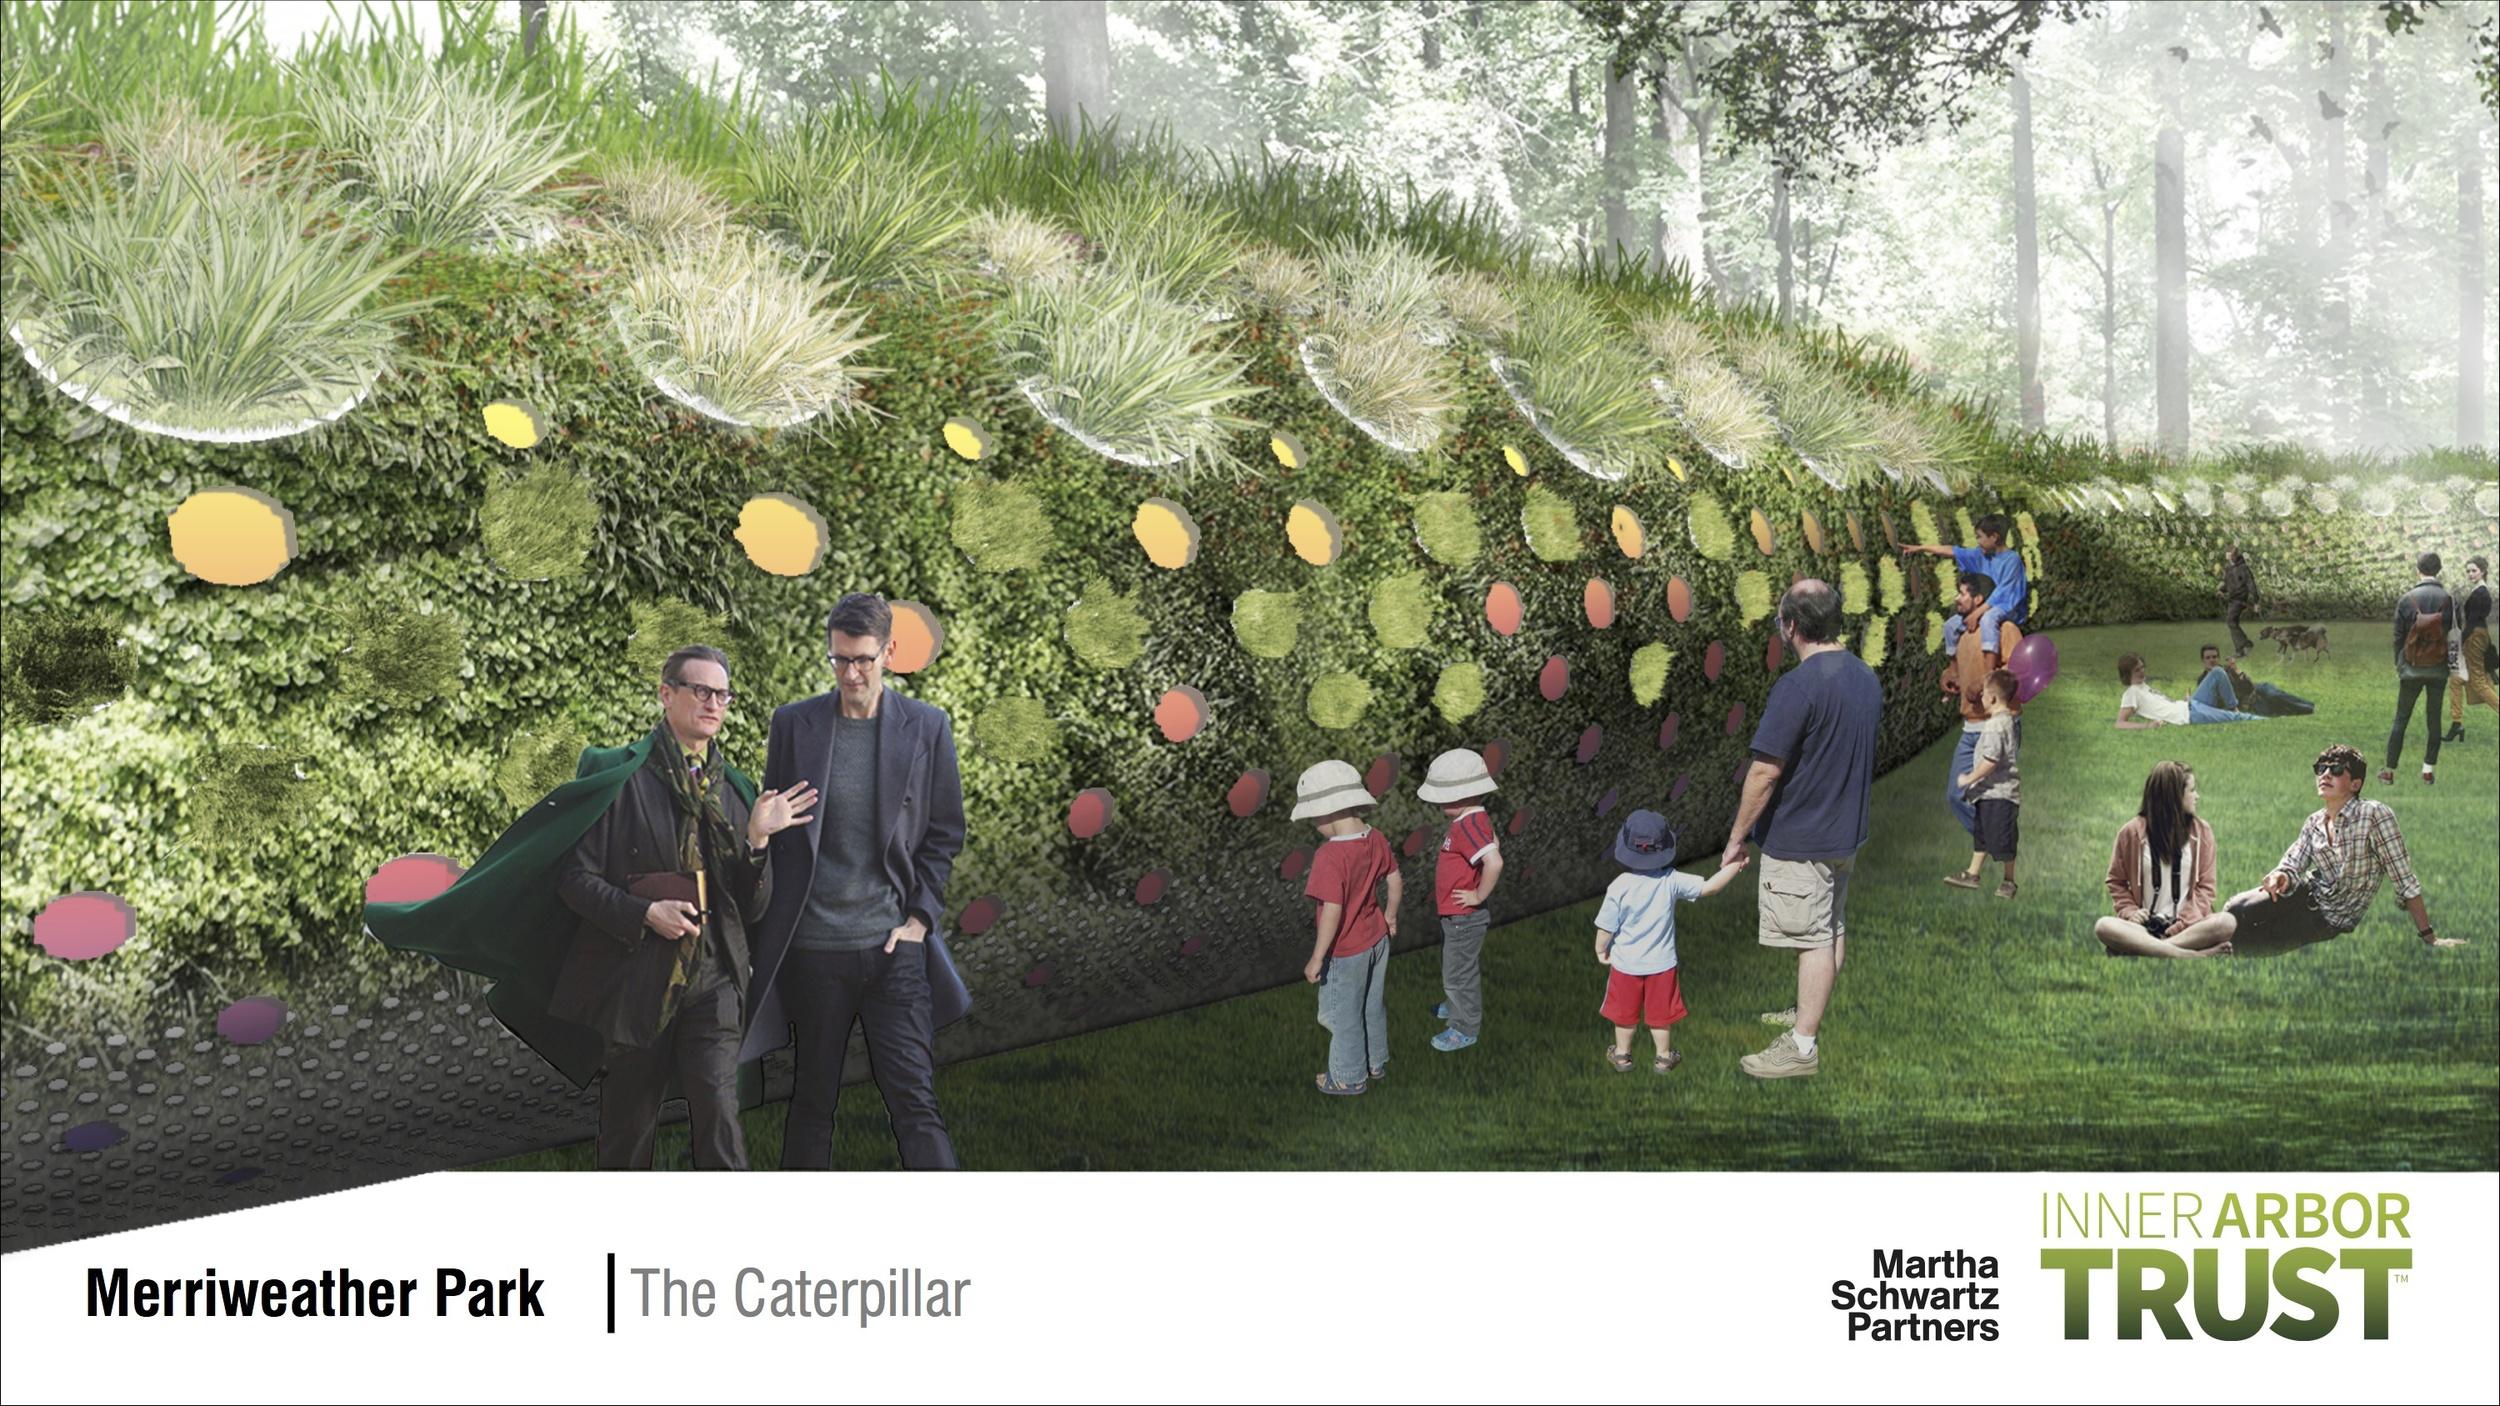 6. Merriweather Park The Caterpillar.jpg